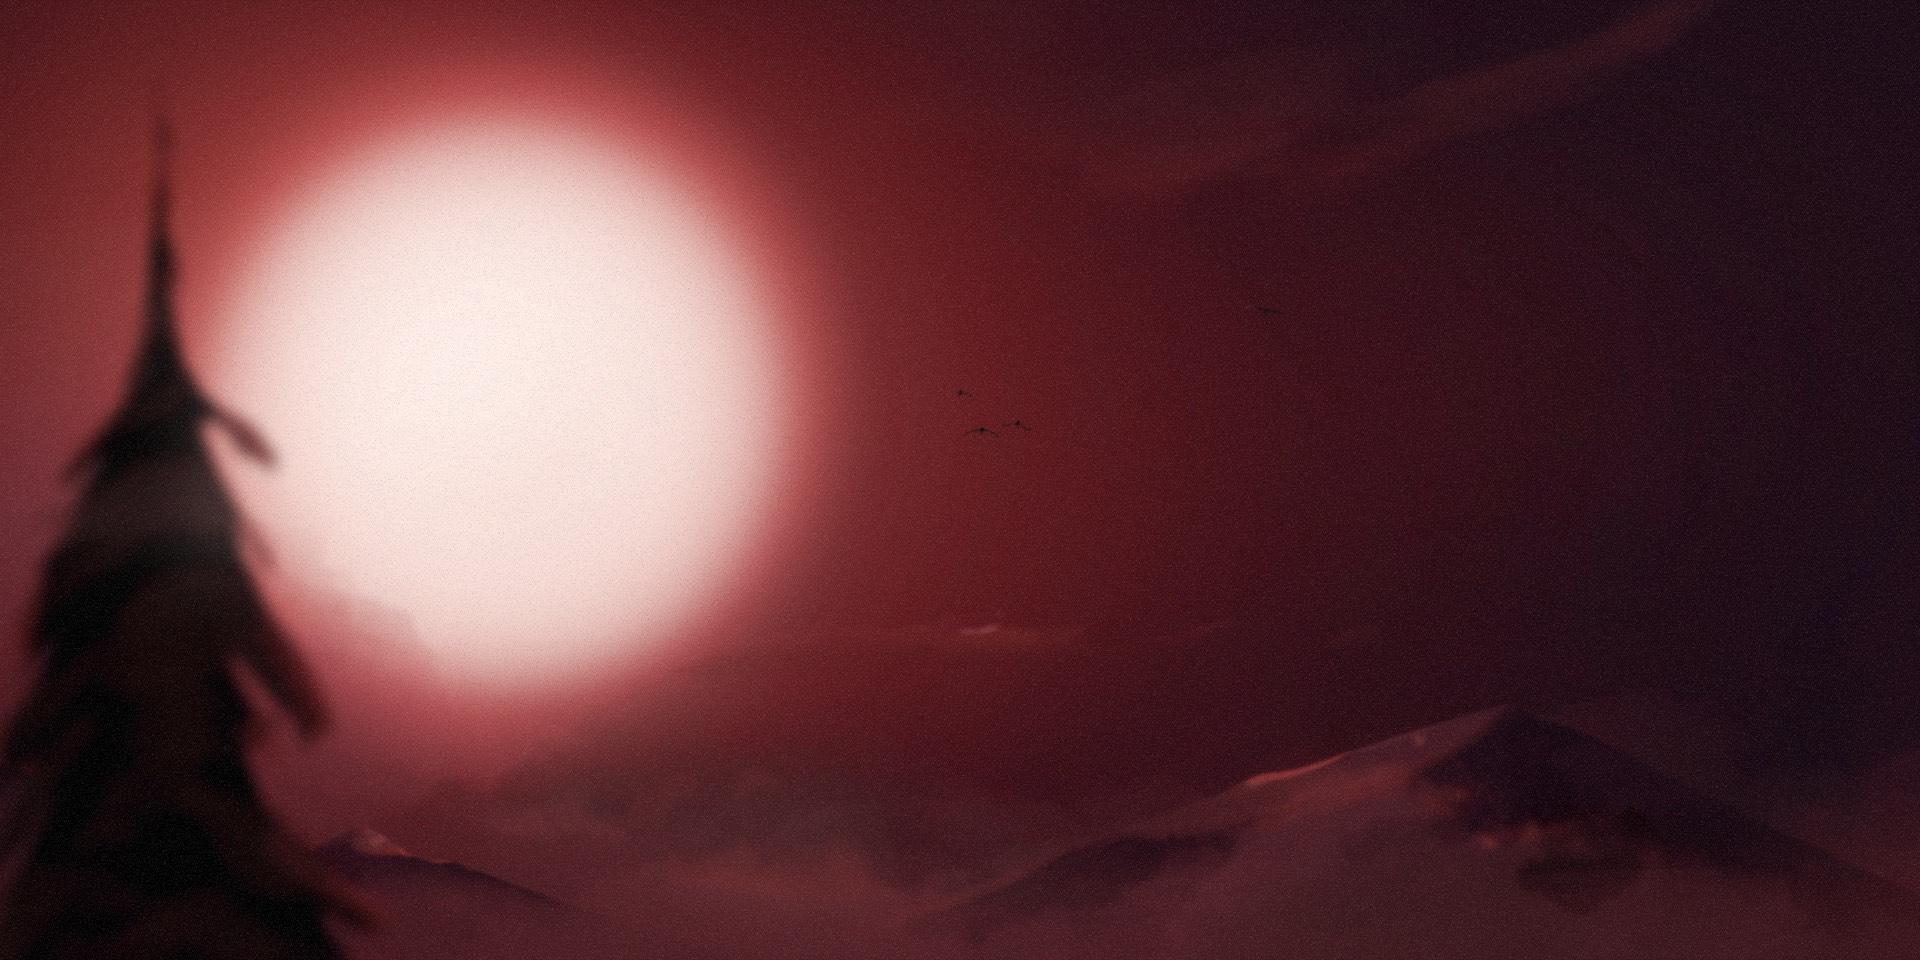 The-Midnight-Sun-Connor-Radding-Short-Film